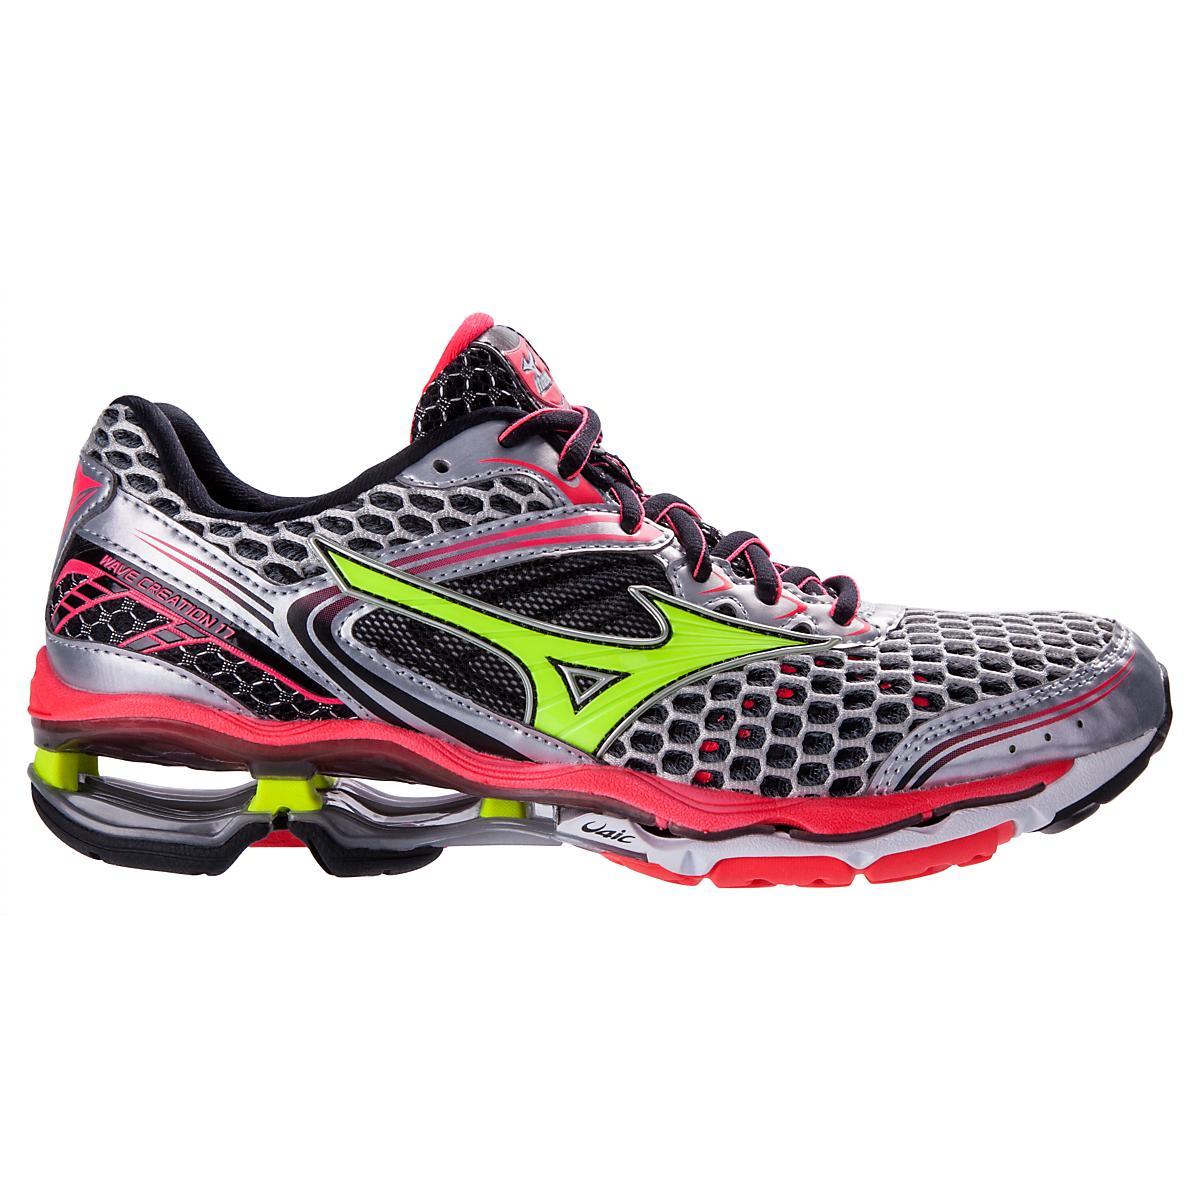 Womens Mizuno Wave Creation 17 Running Shoe at Road Runner Sports a9ec0c6897d03